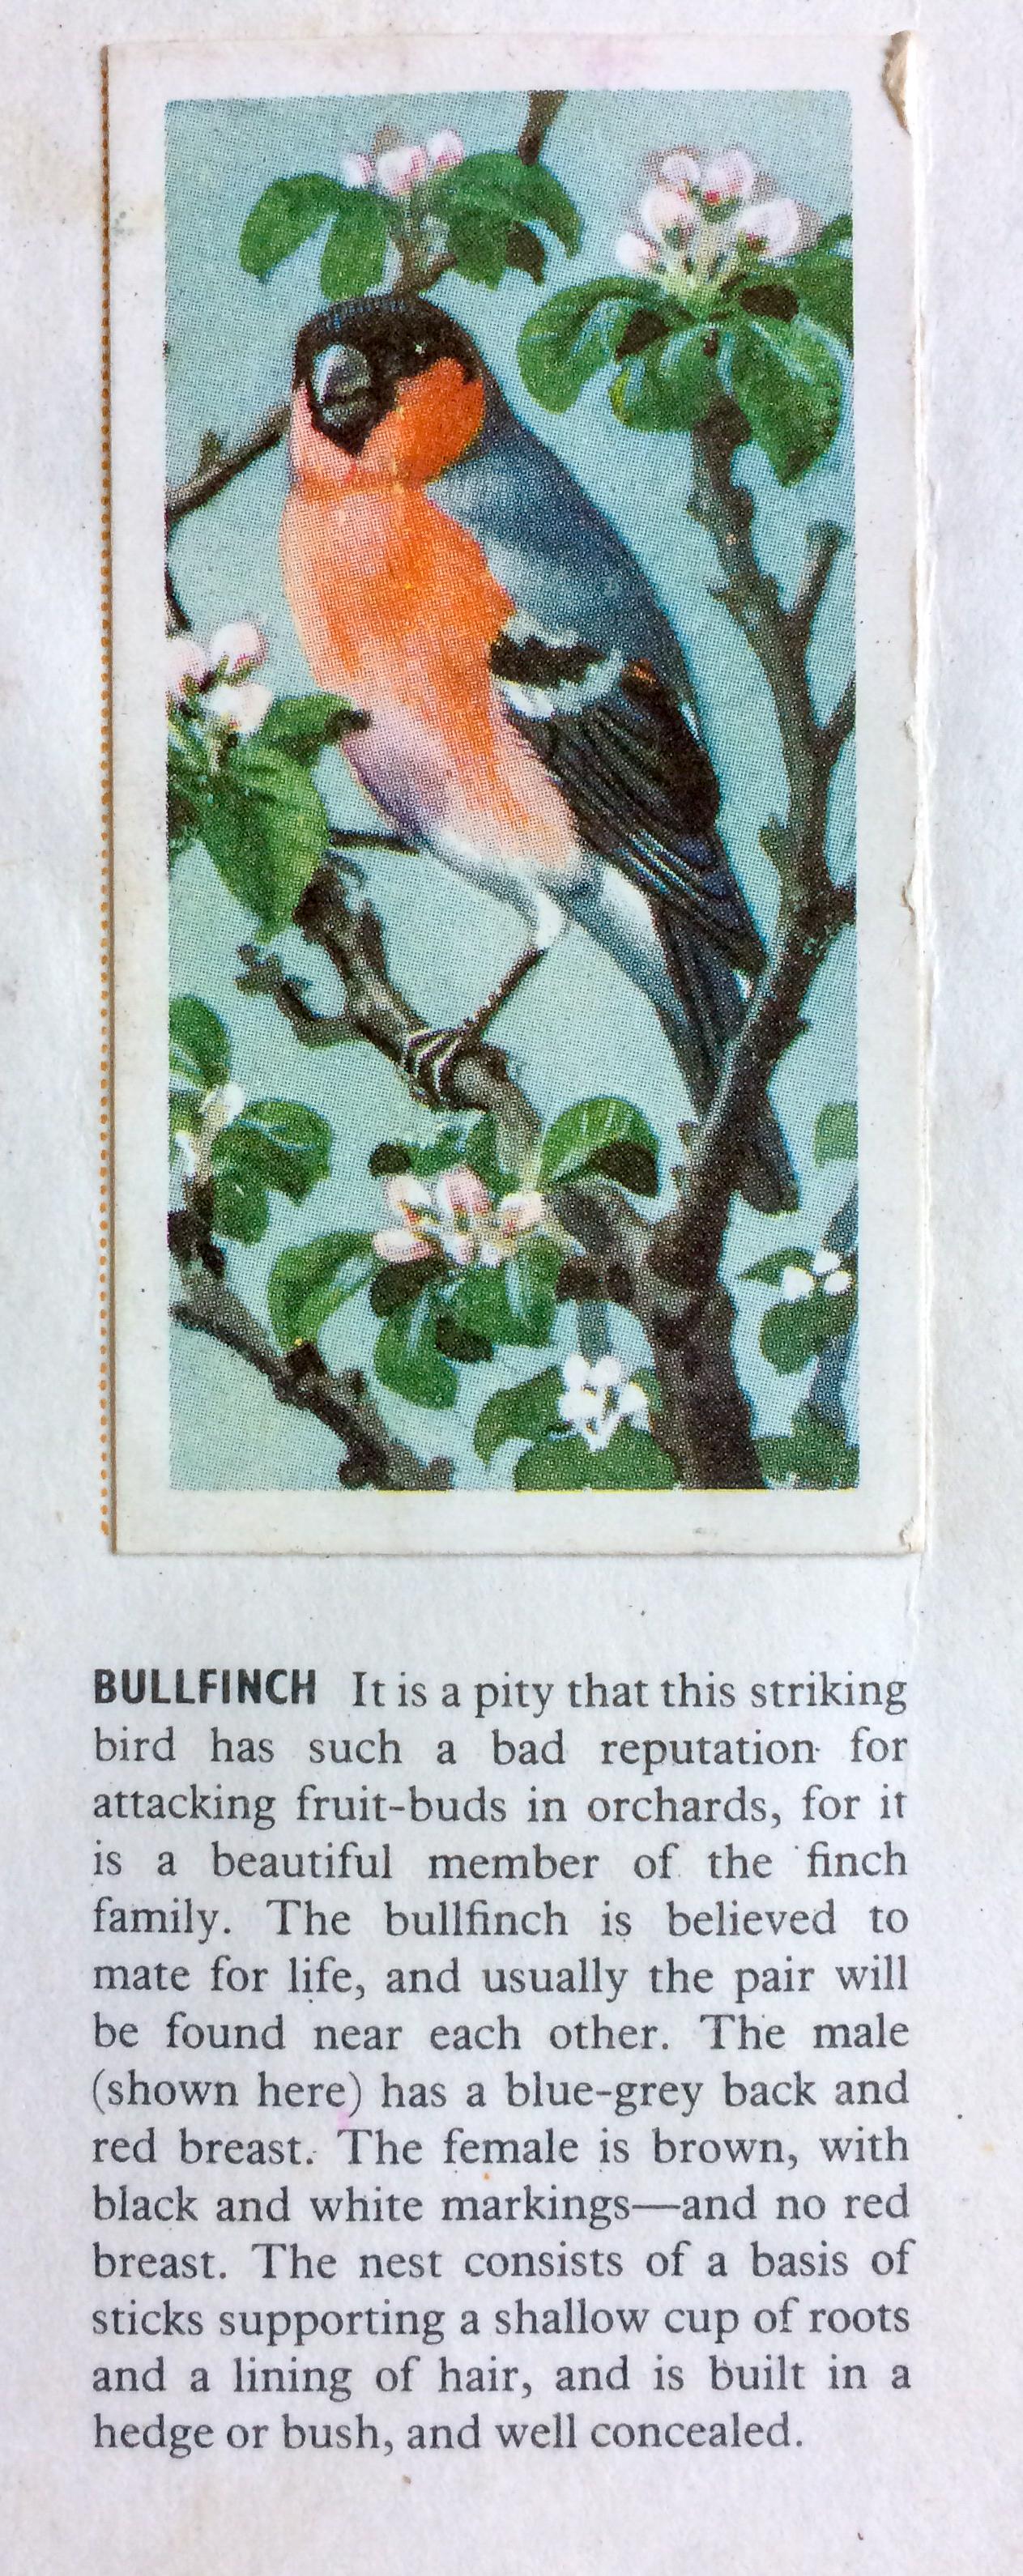 Brooke Bond - Bullfinch - The Hall of Einar - Tunnicliffe